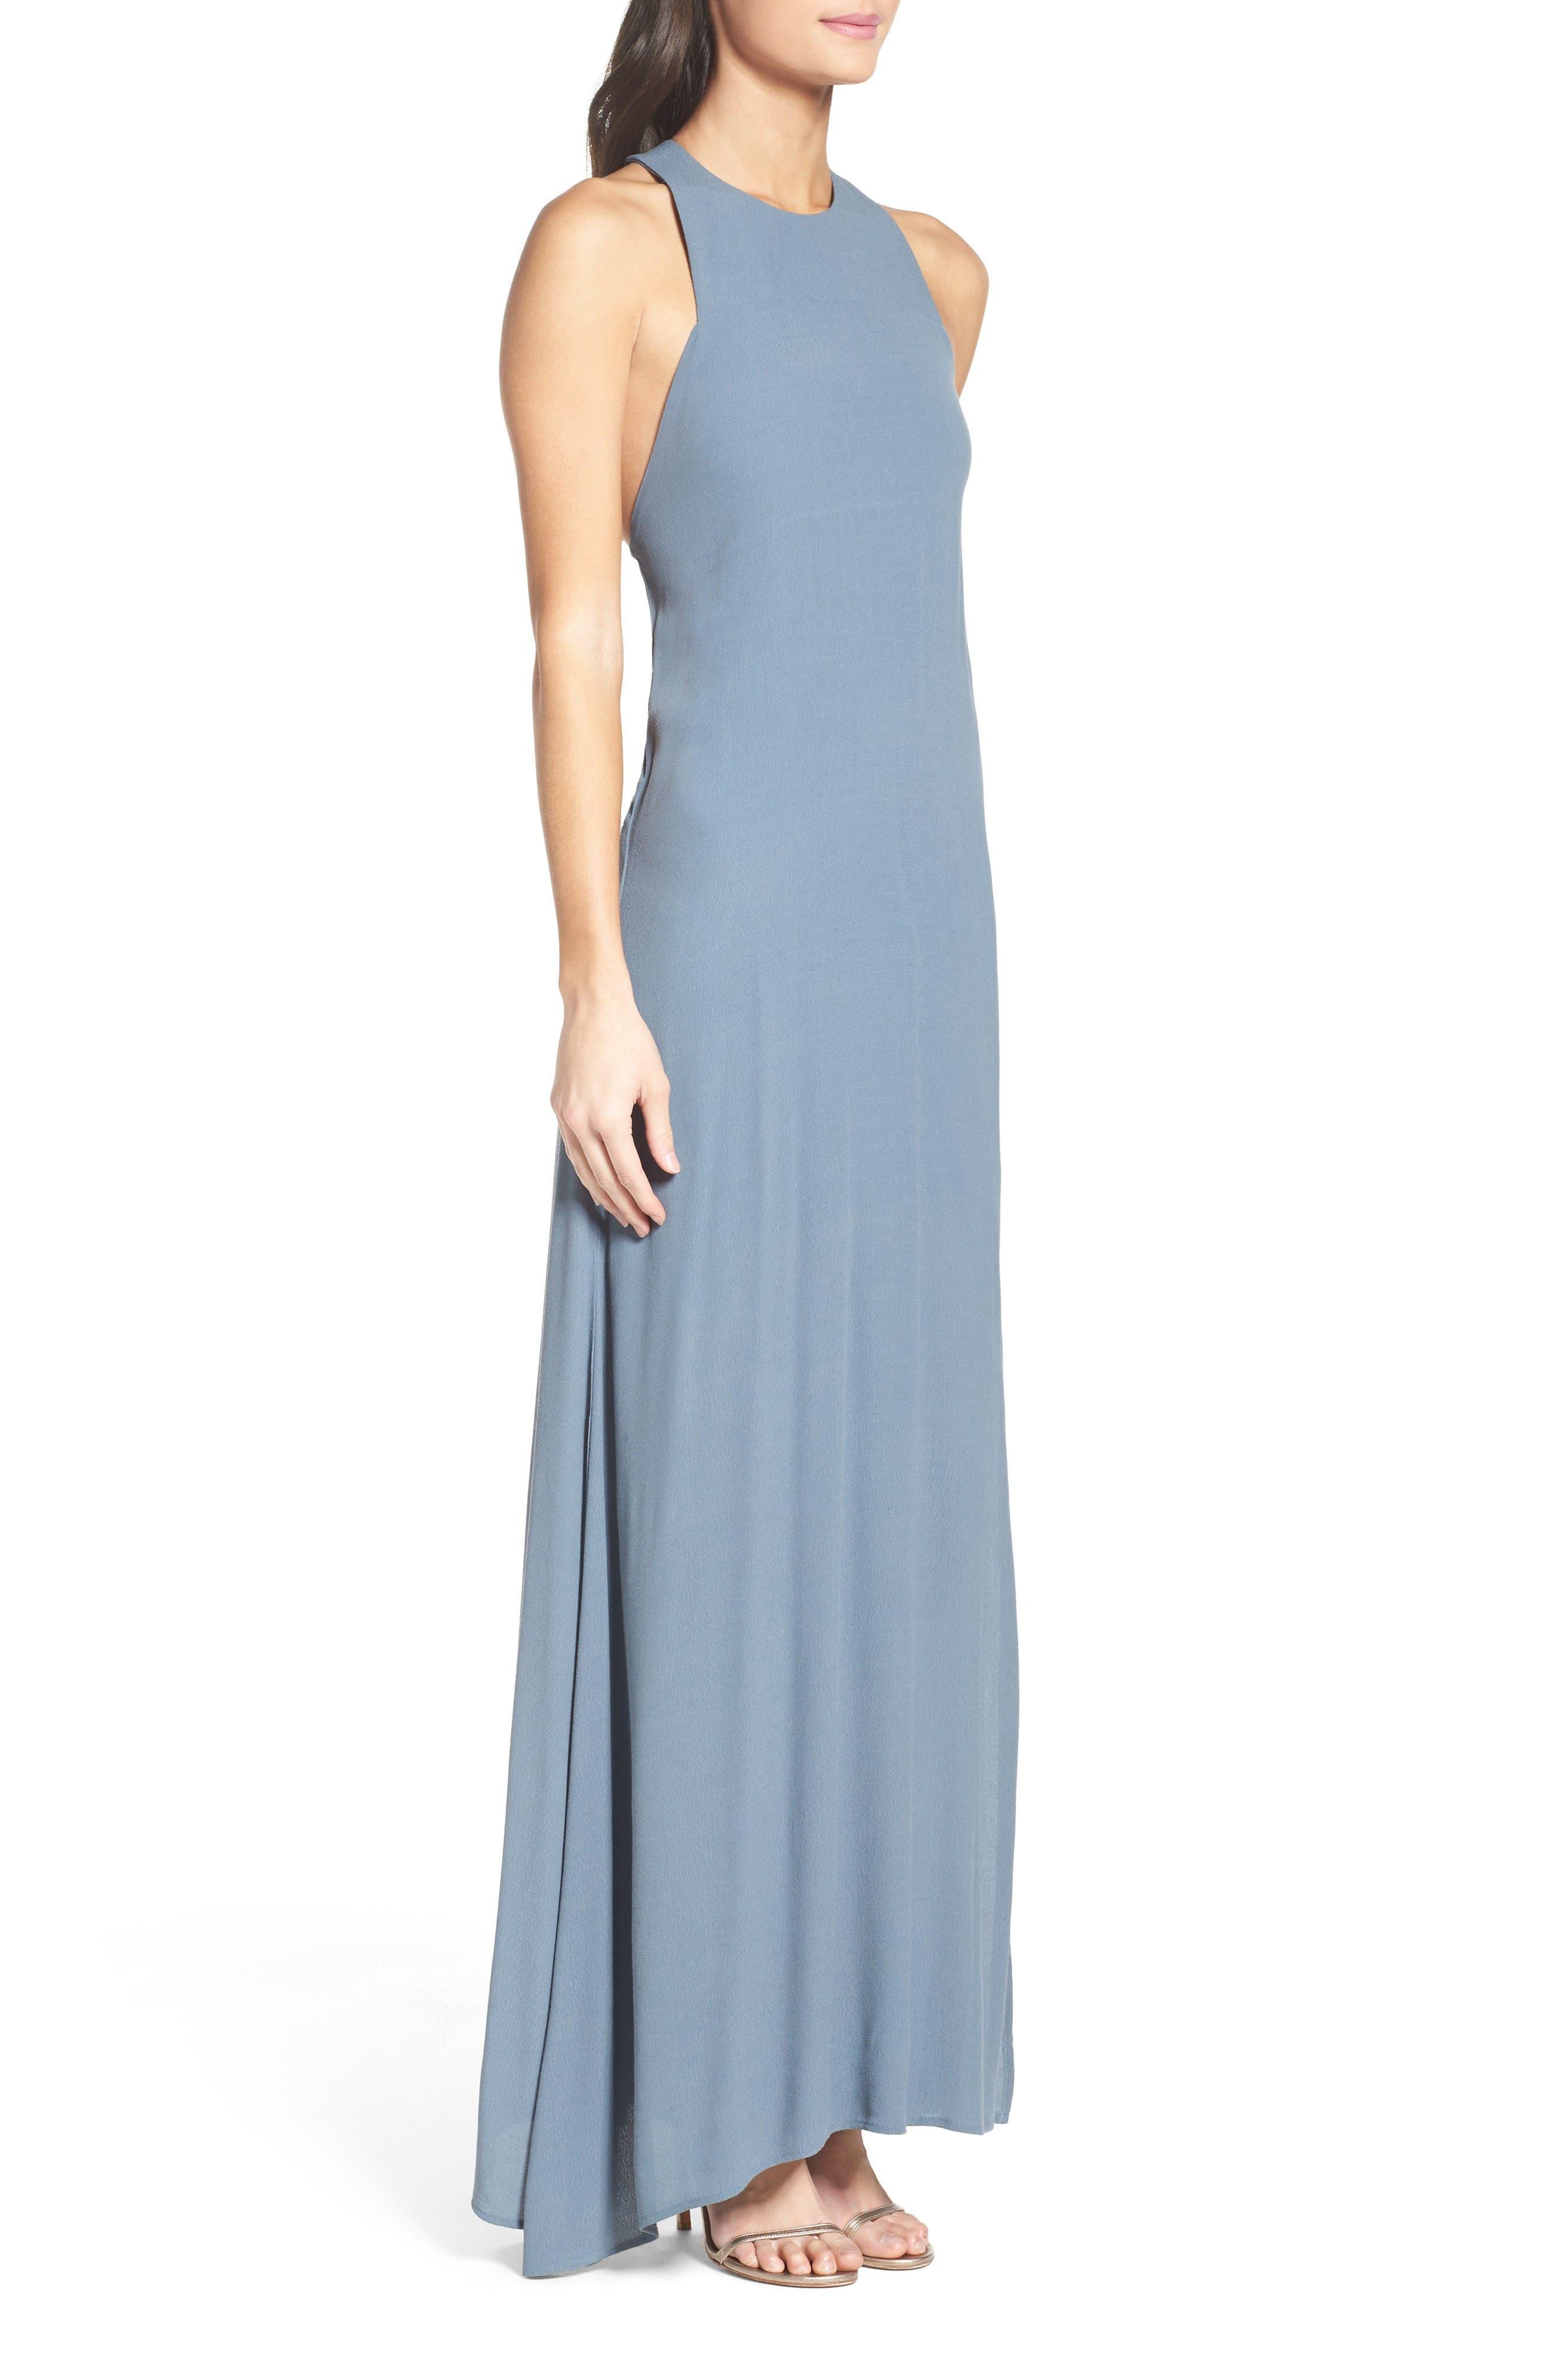 Alternate Image 3  - Roe + May Bordeaux Crepe Dress